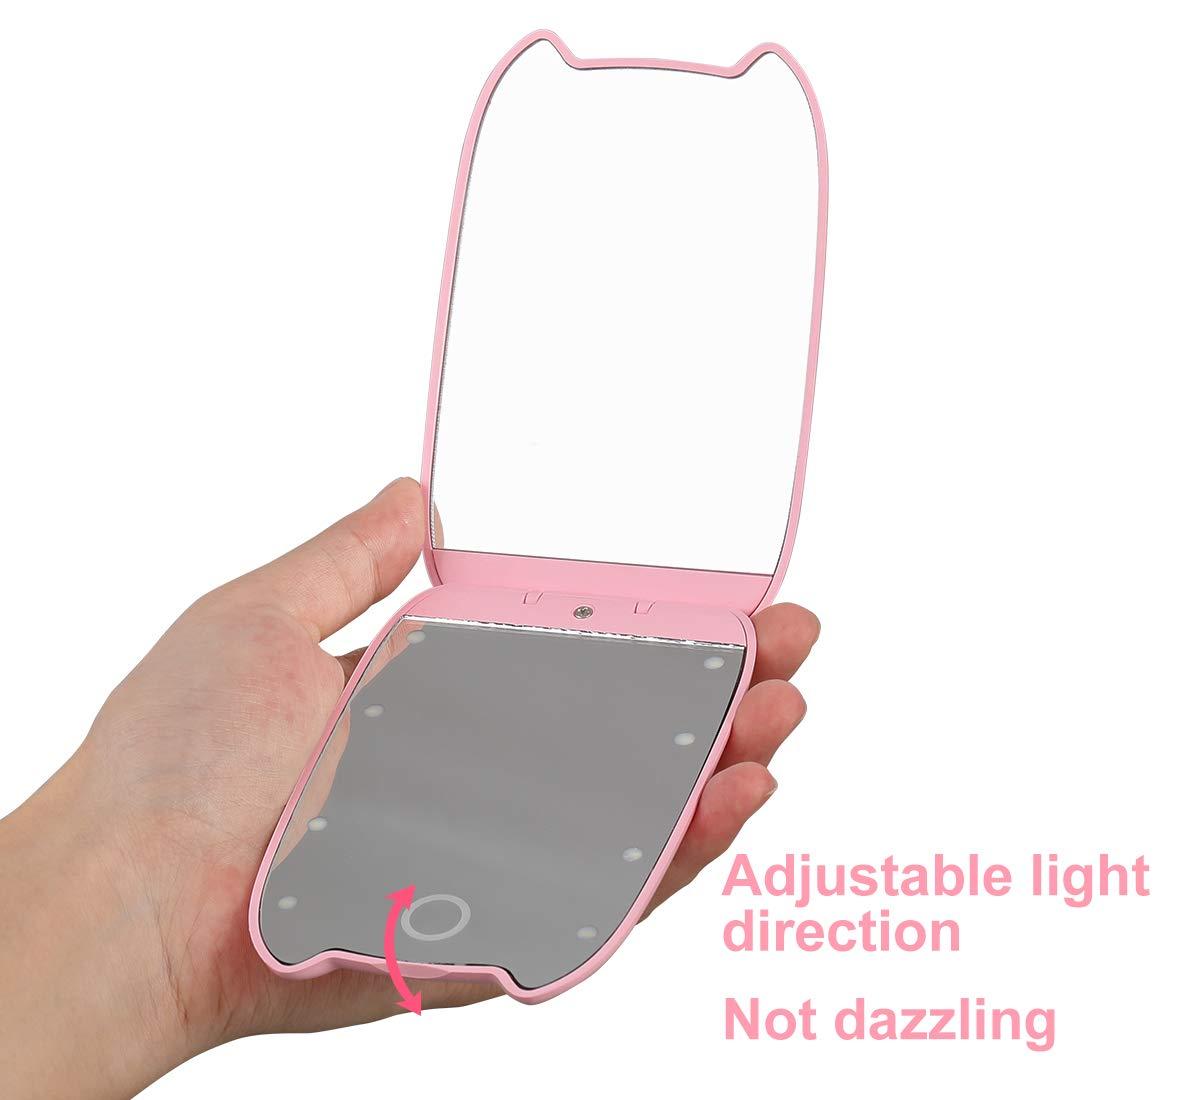 Amazon.com: Looife - Espejo de maquillaje con luz LED, 2 ...